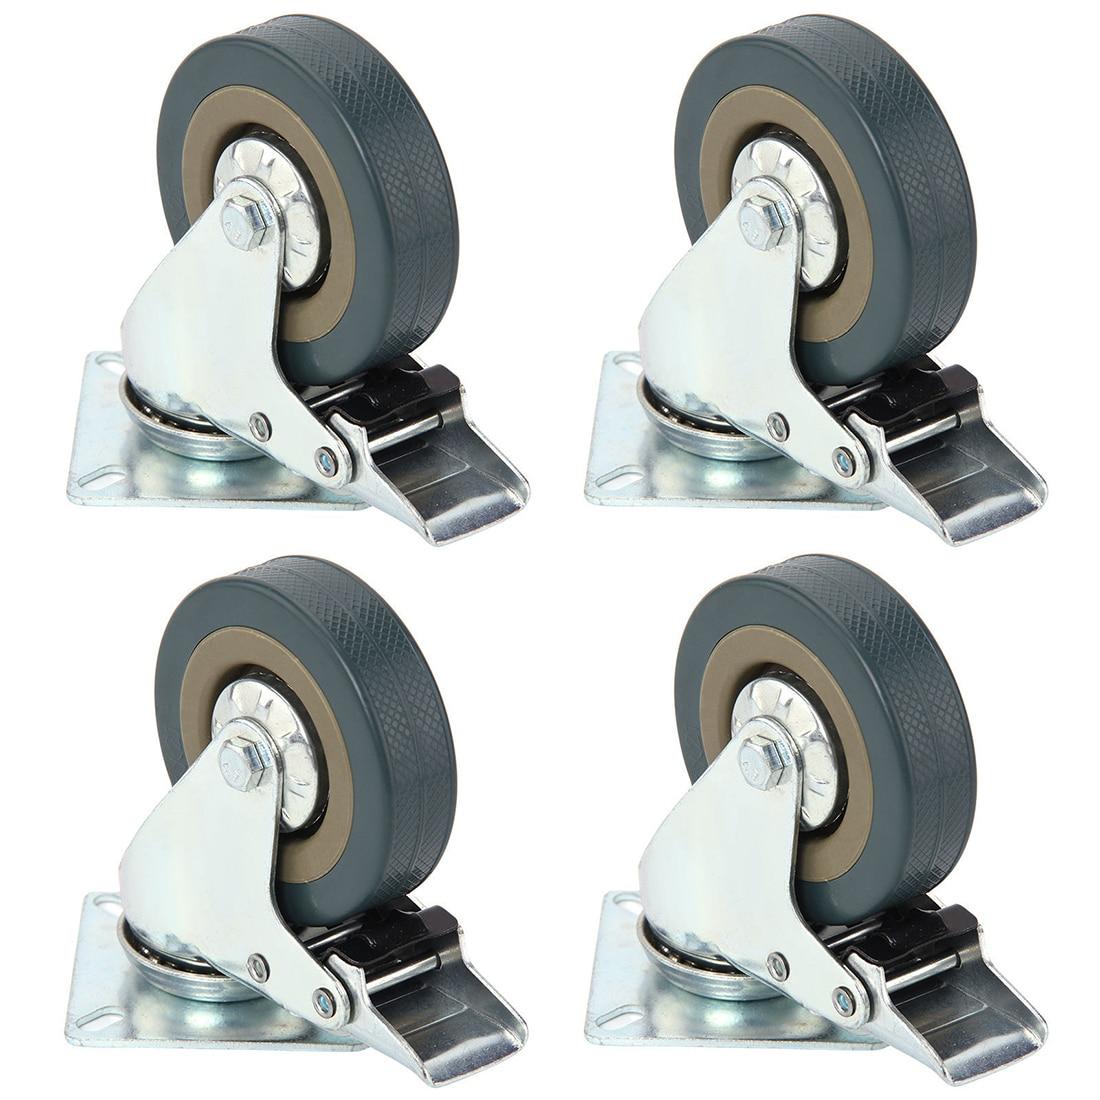 conjunto-de-heavy-duty-50x17mm-de-borracha-rodas-do-rodizio-giratorio-trolley-rodizio-de-freio-40-kgmodel-4-com-freio